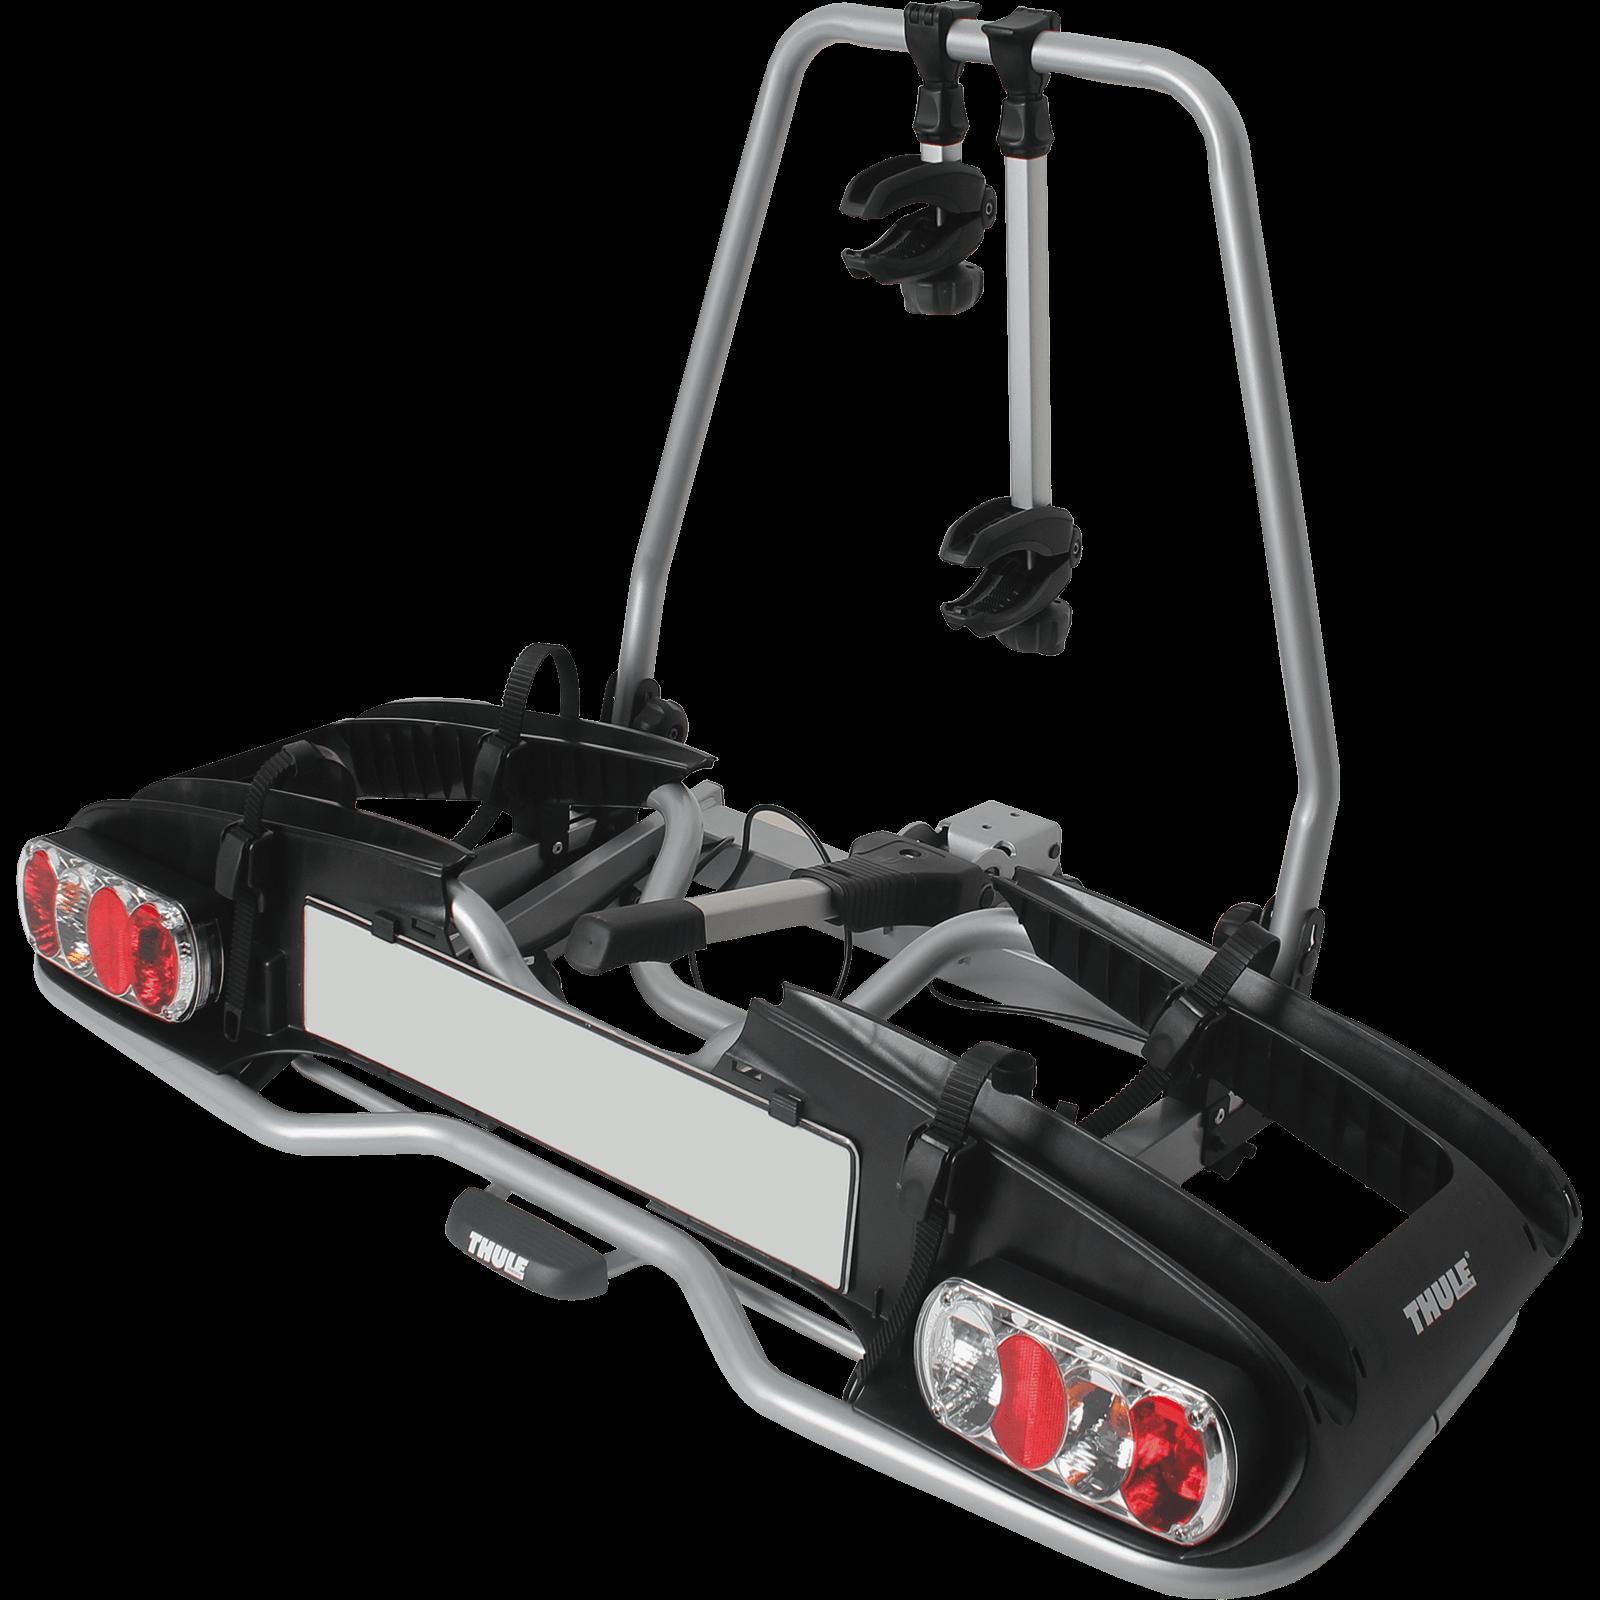 fahrradtr ger thule euro power 915 f r 2 fahrr der montage auf der anh ngerkupplung nutzlast. Black Bedroom Furniture Sets. Home Design Ideas